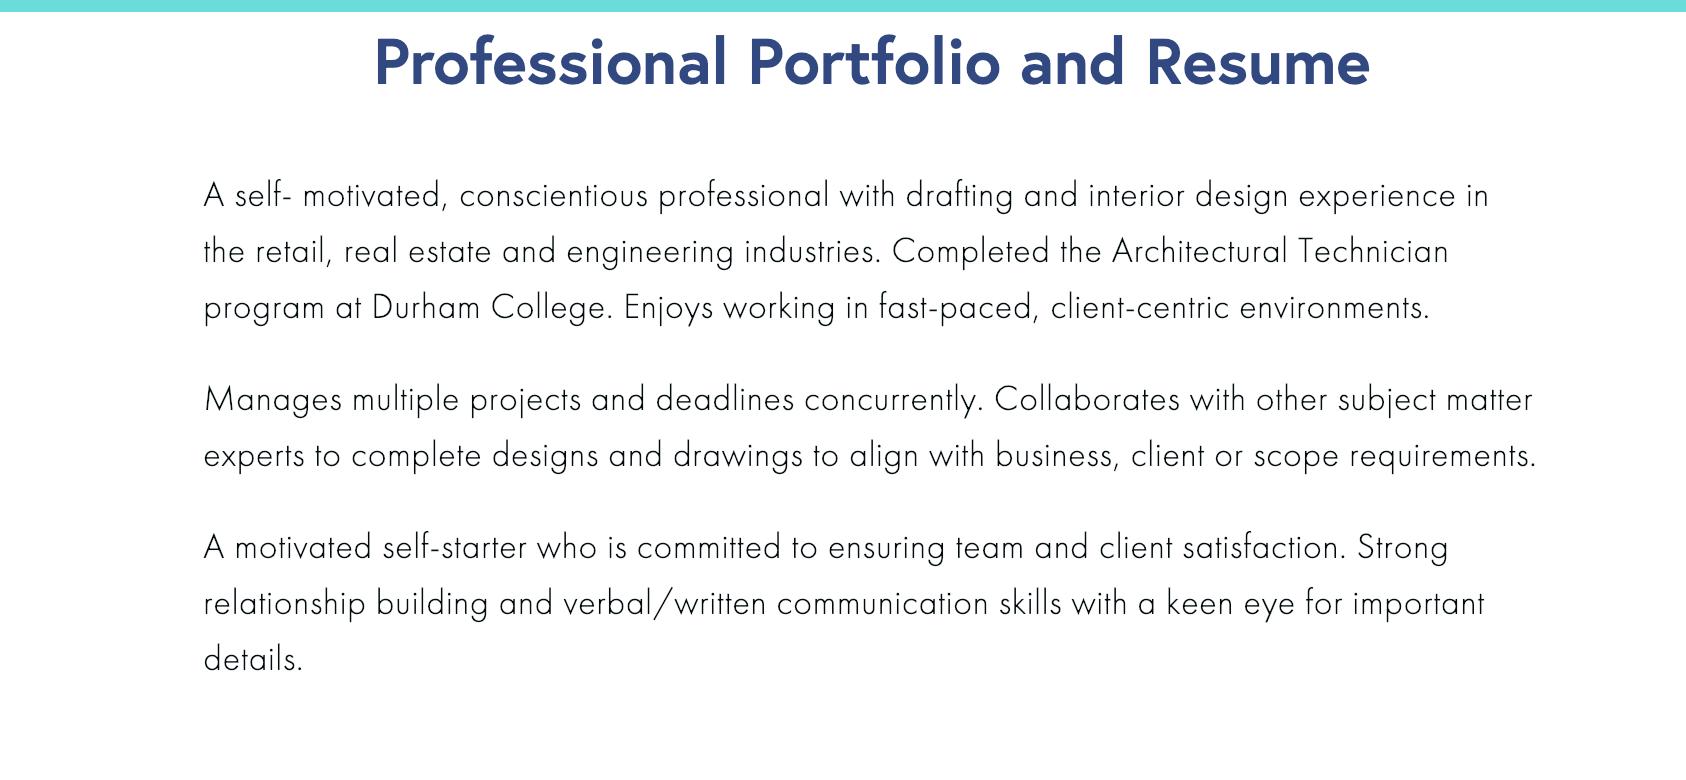 Professional Portfolio Summary